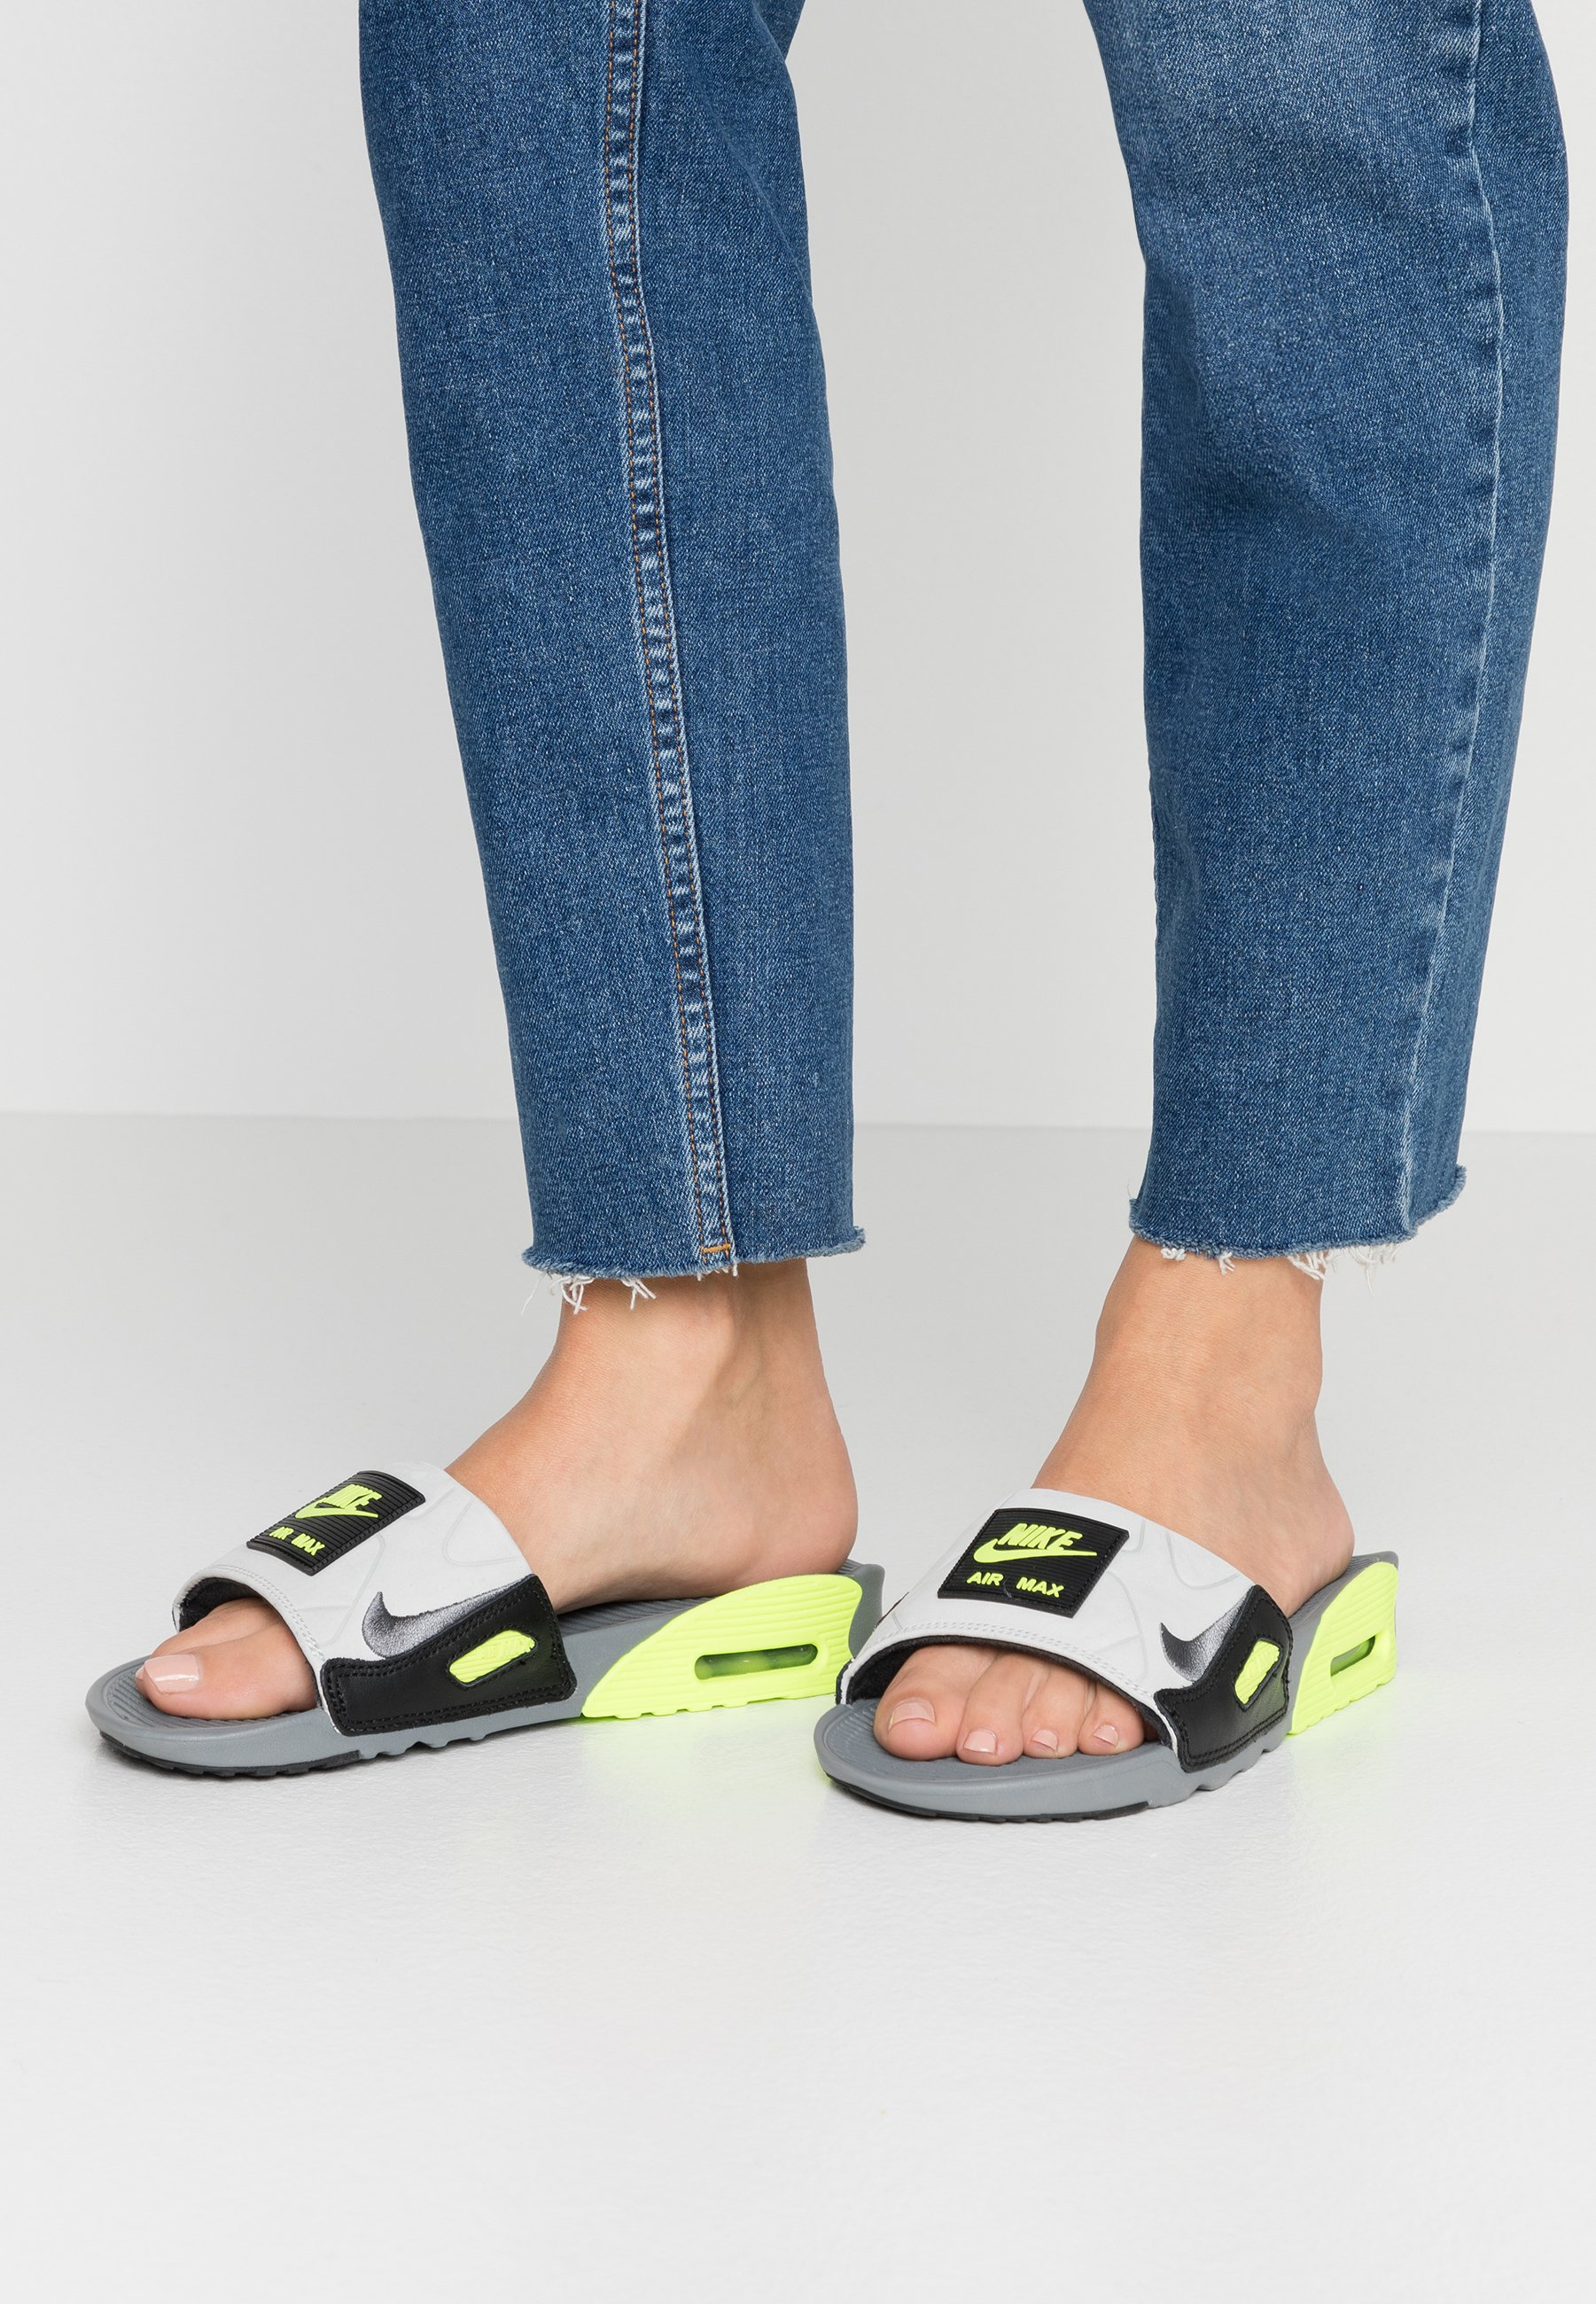 Nike Sportswear NIKE AIR MAX 90 DAMEN-SLIDES - Sandales de bain ...